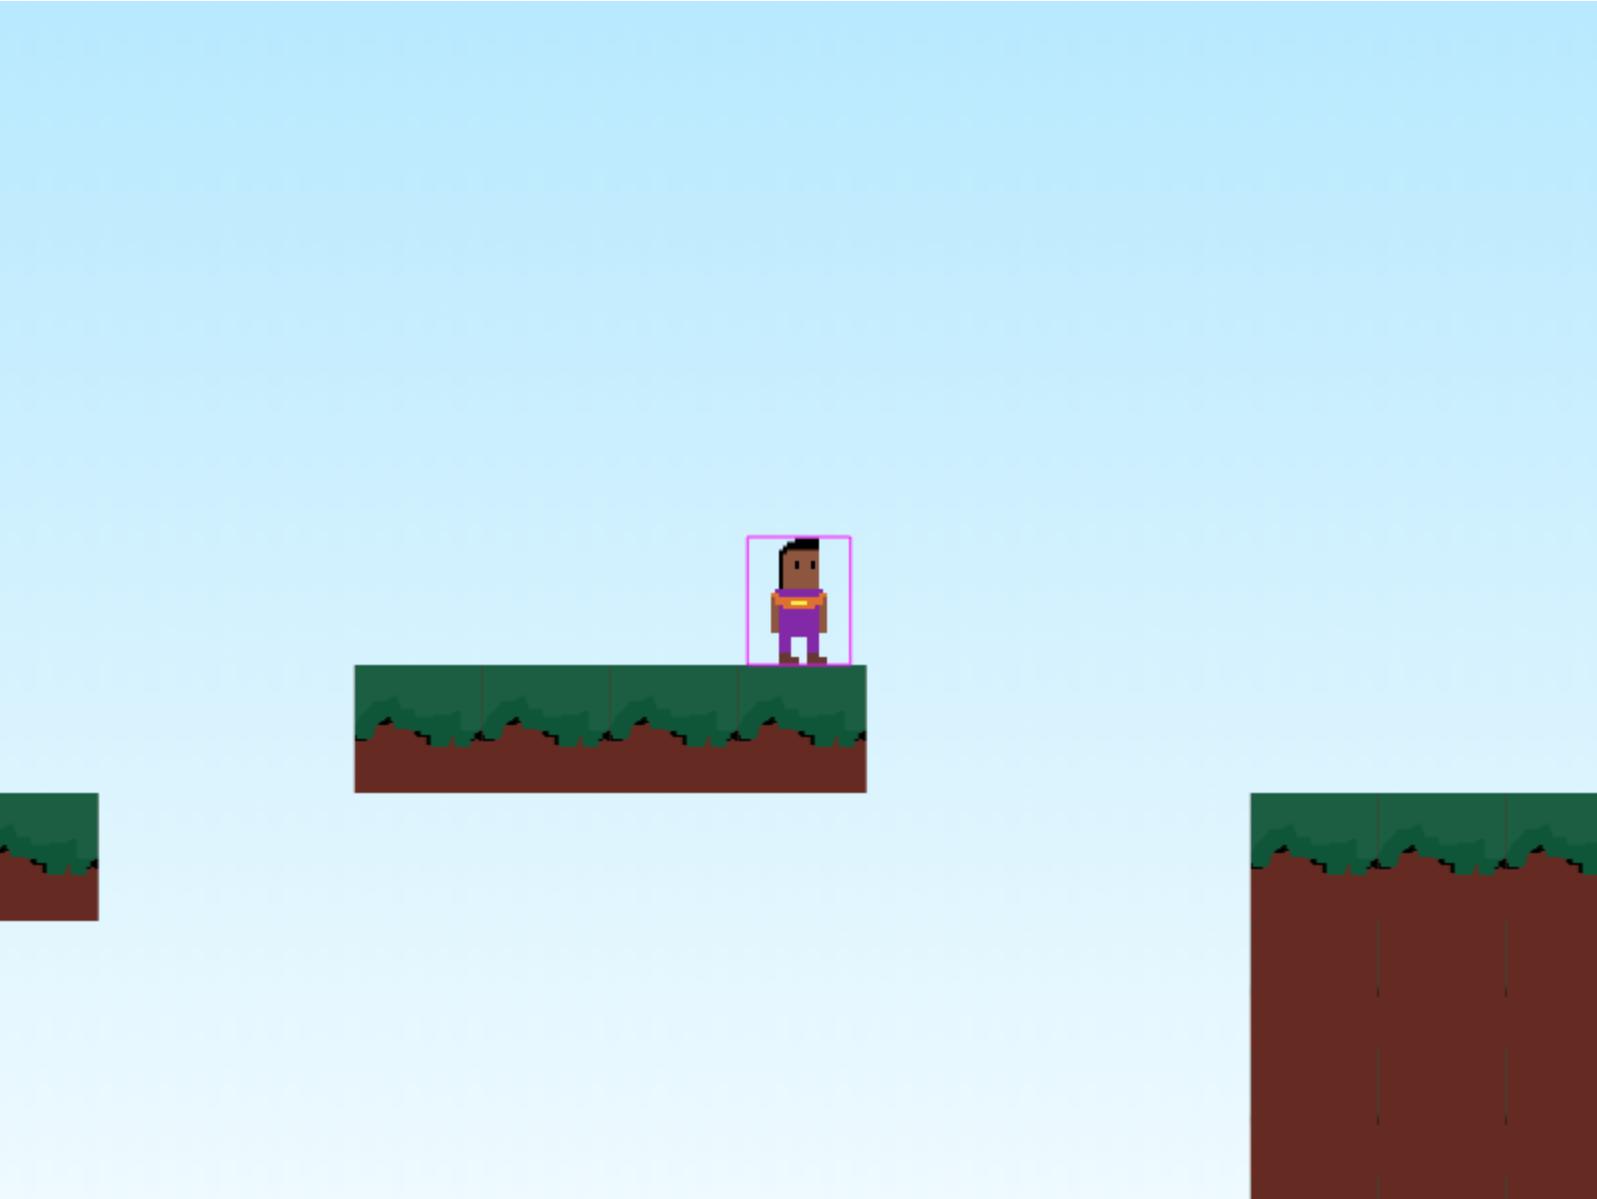 Escape Boy first level